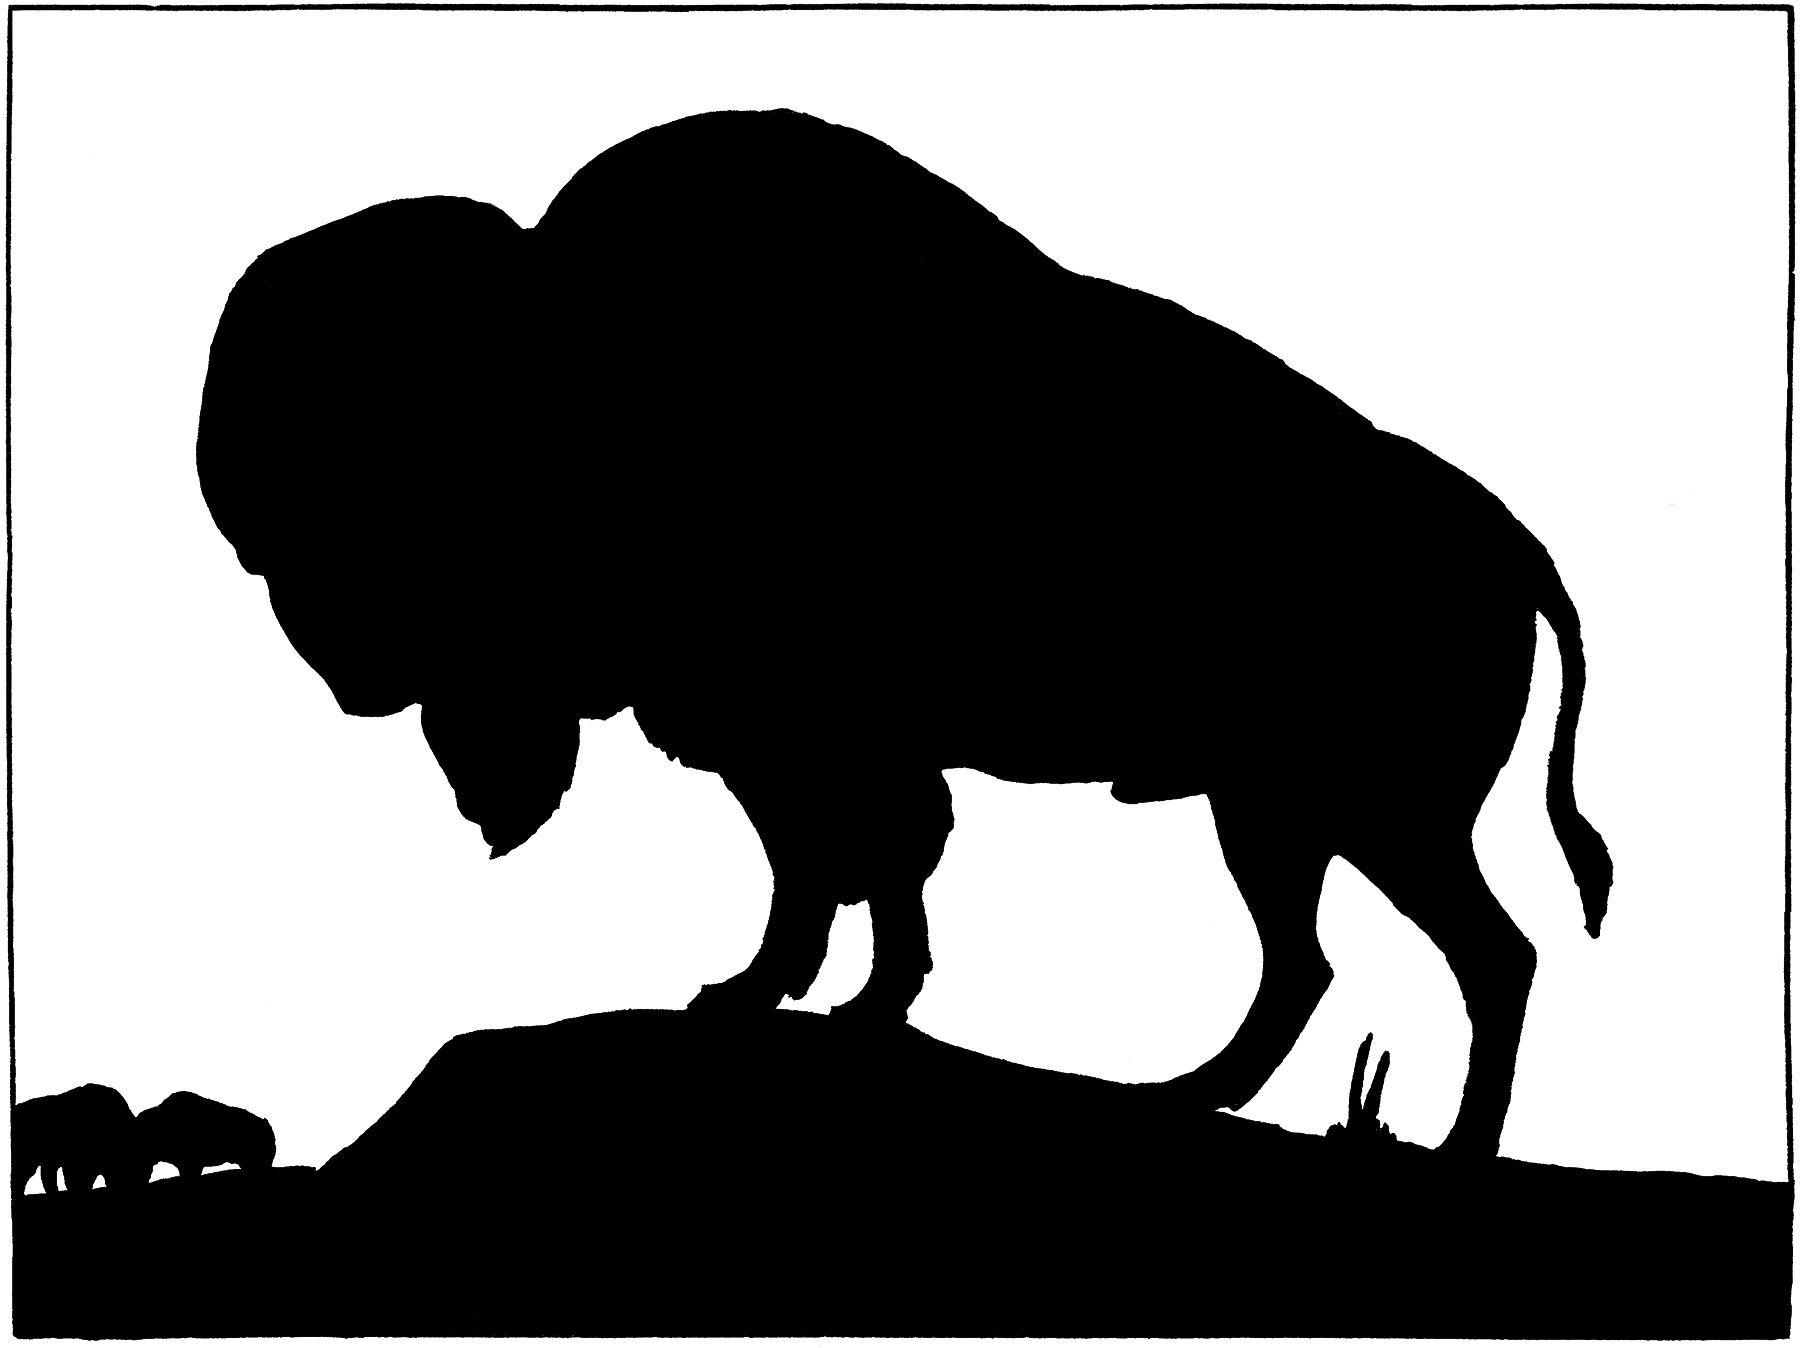 Native american buffalo clipart free silhouette vector free download Vintage Buffalo Silhouette Image! | Barn Wood Projects ... vector free download